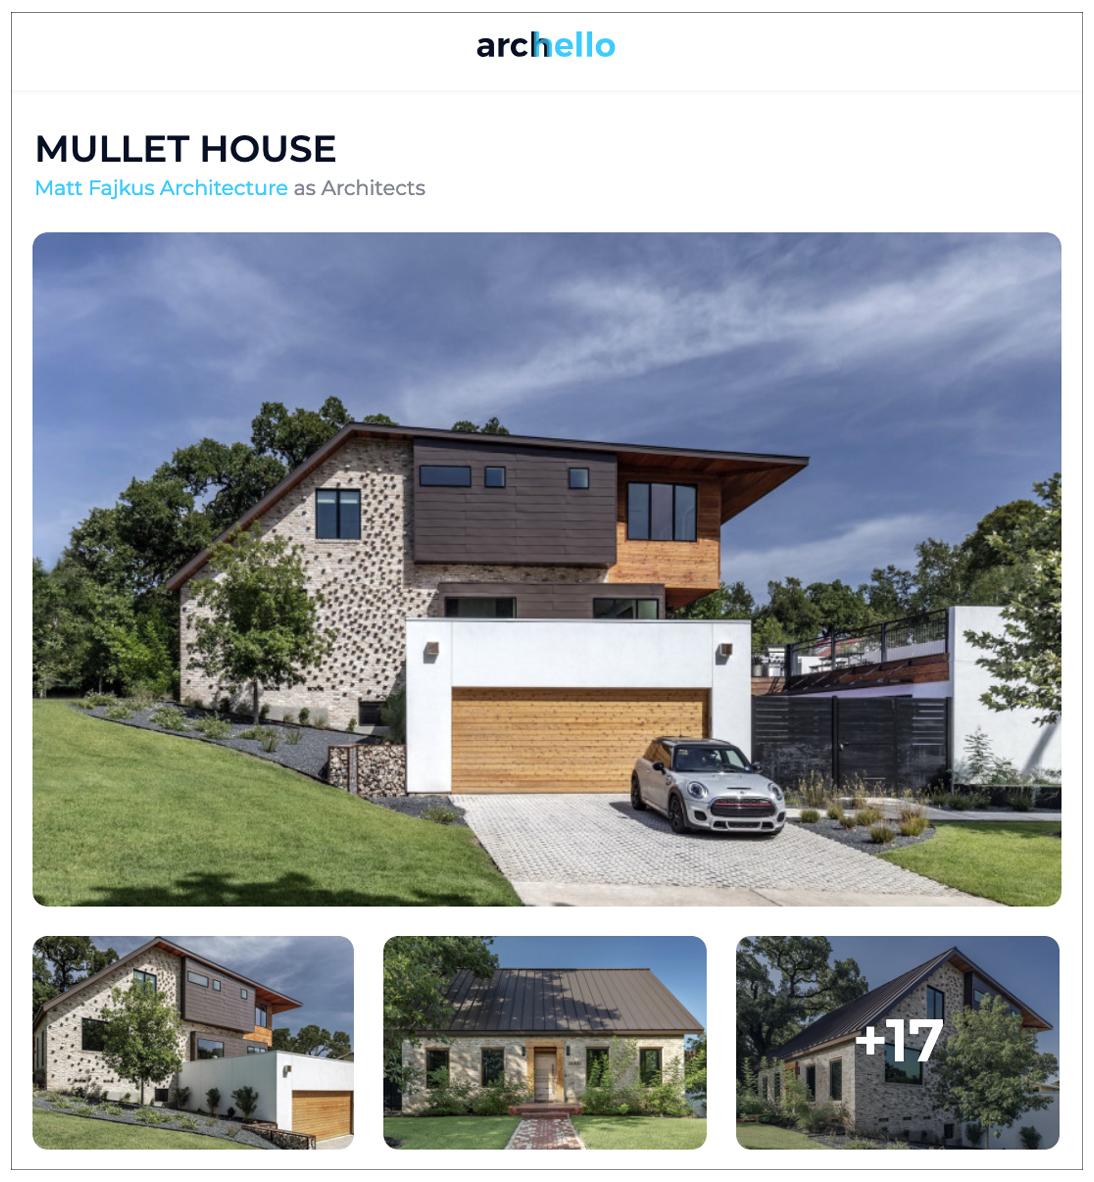 2019_0201 Archello - Mullet.jpg